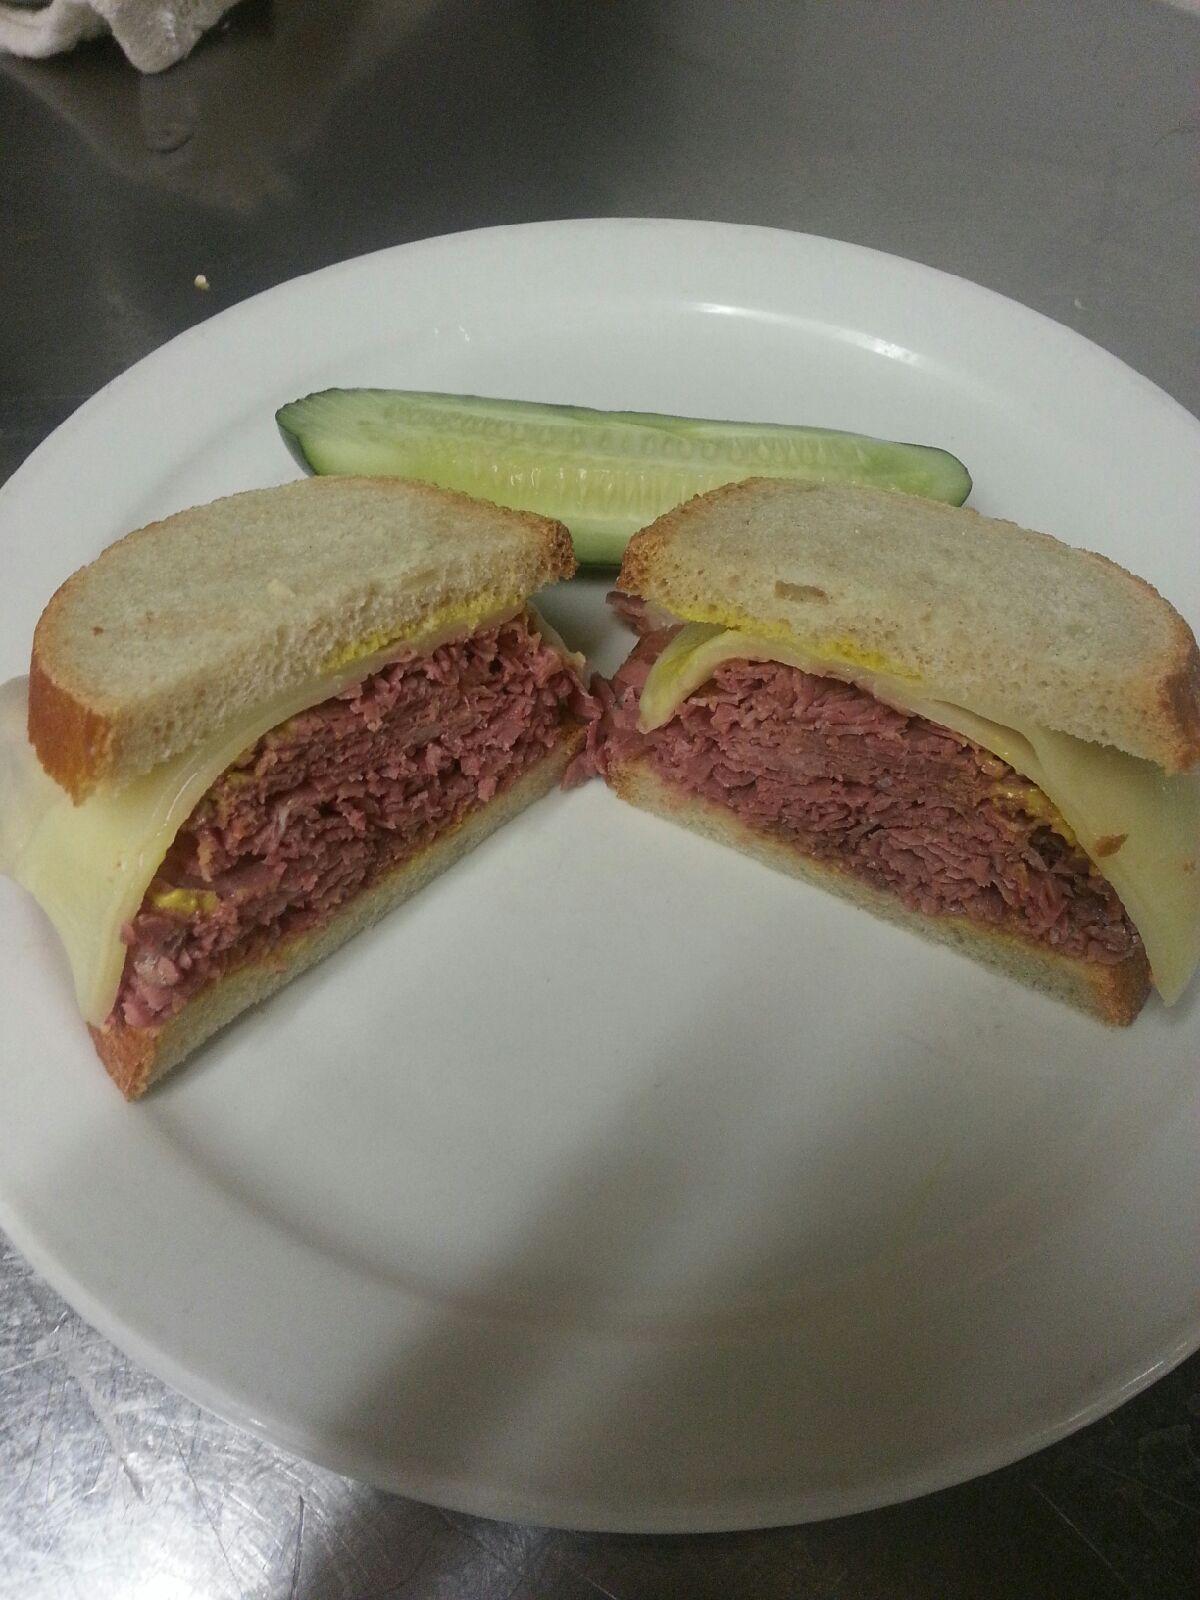 #1 1/2 Duane's Corned Beef Image